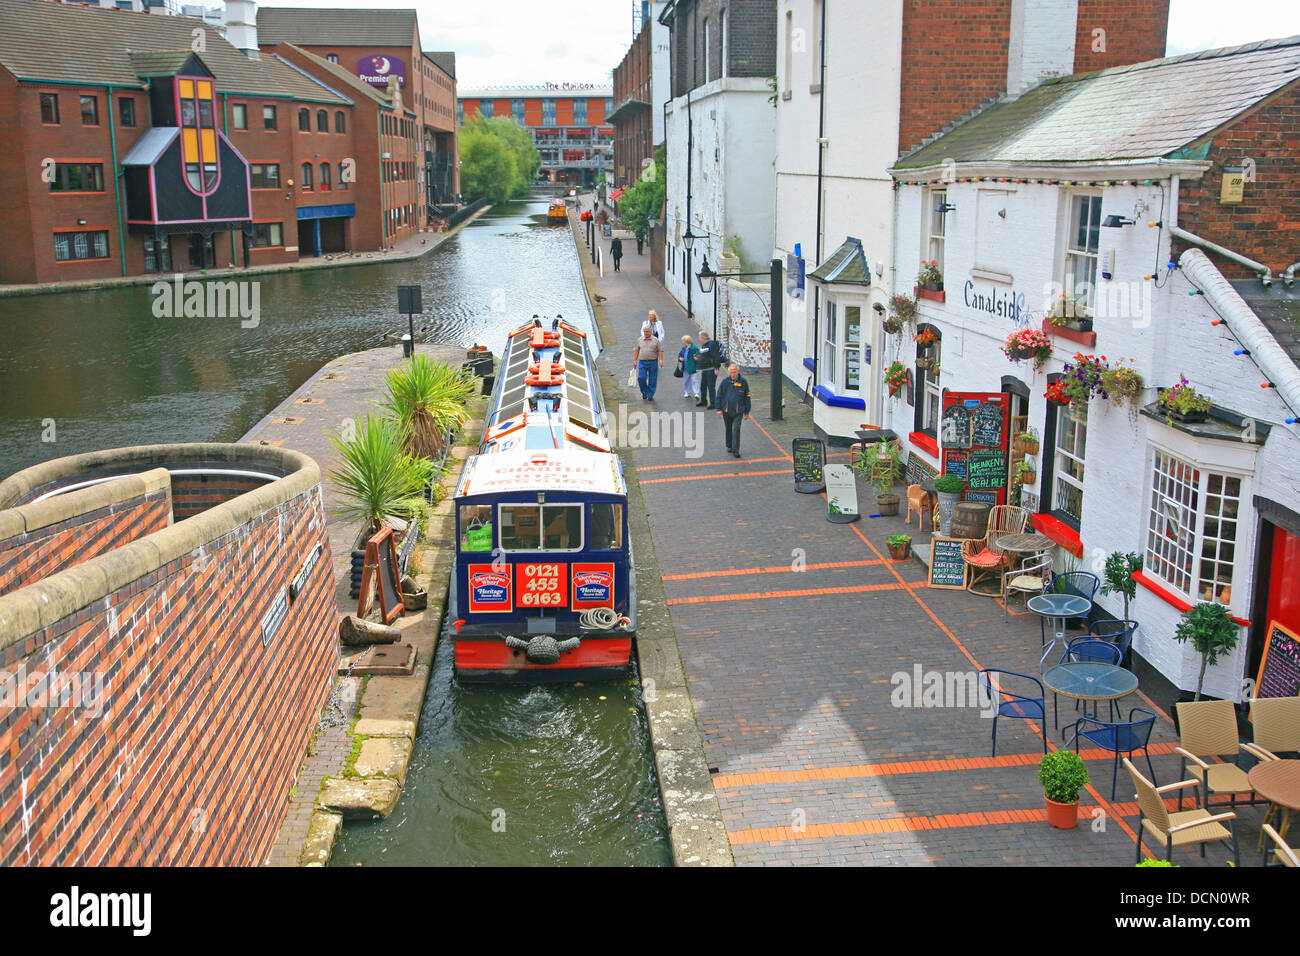 ENGLAND WEST MIDLANDS BIRMINGHAM The Birmingham Canal at Brindley Place - Stock Image